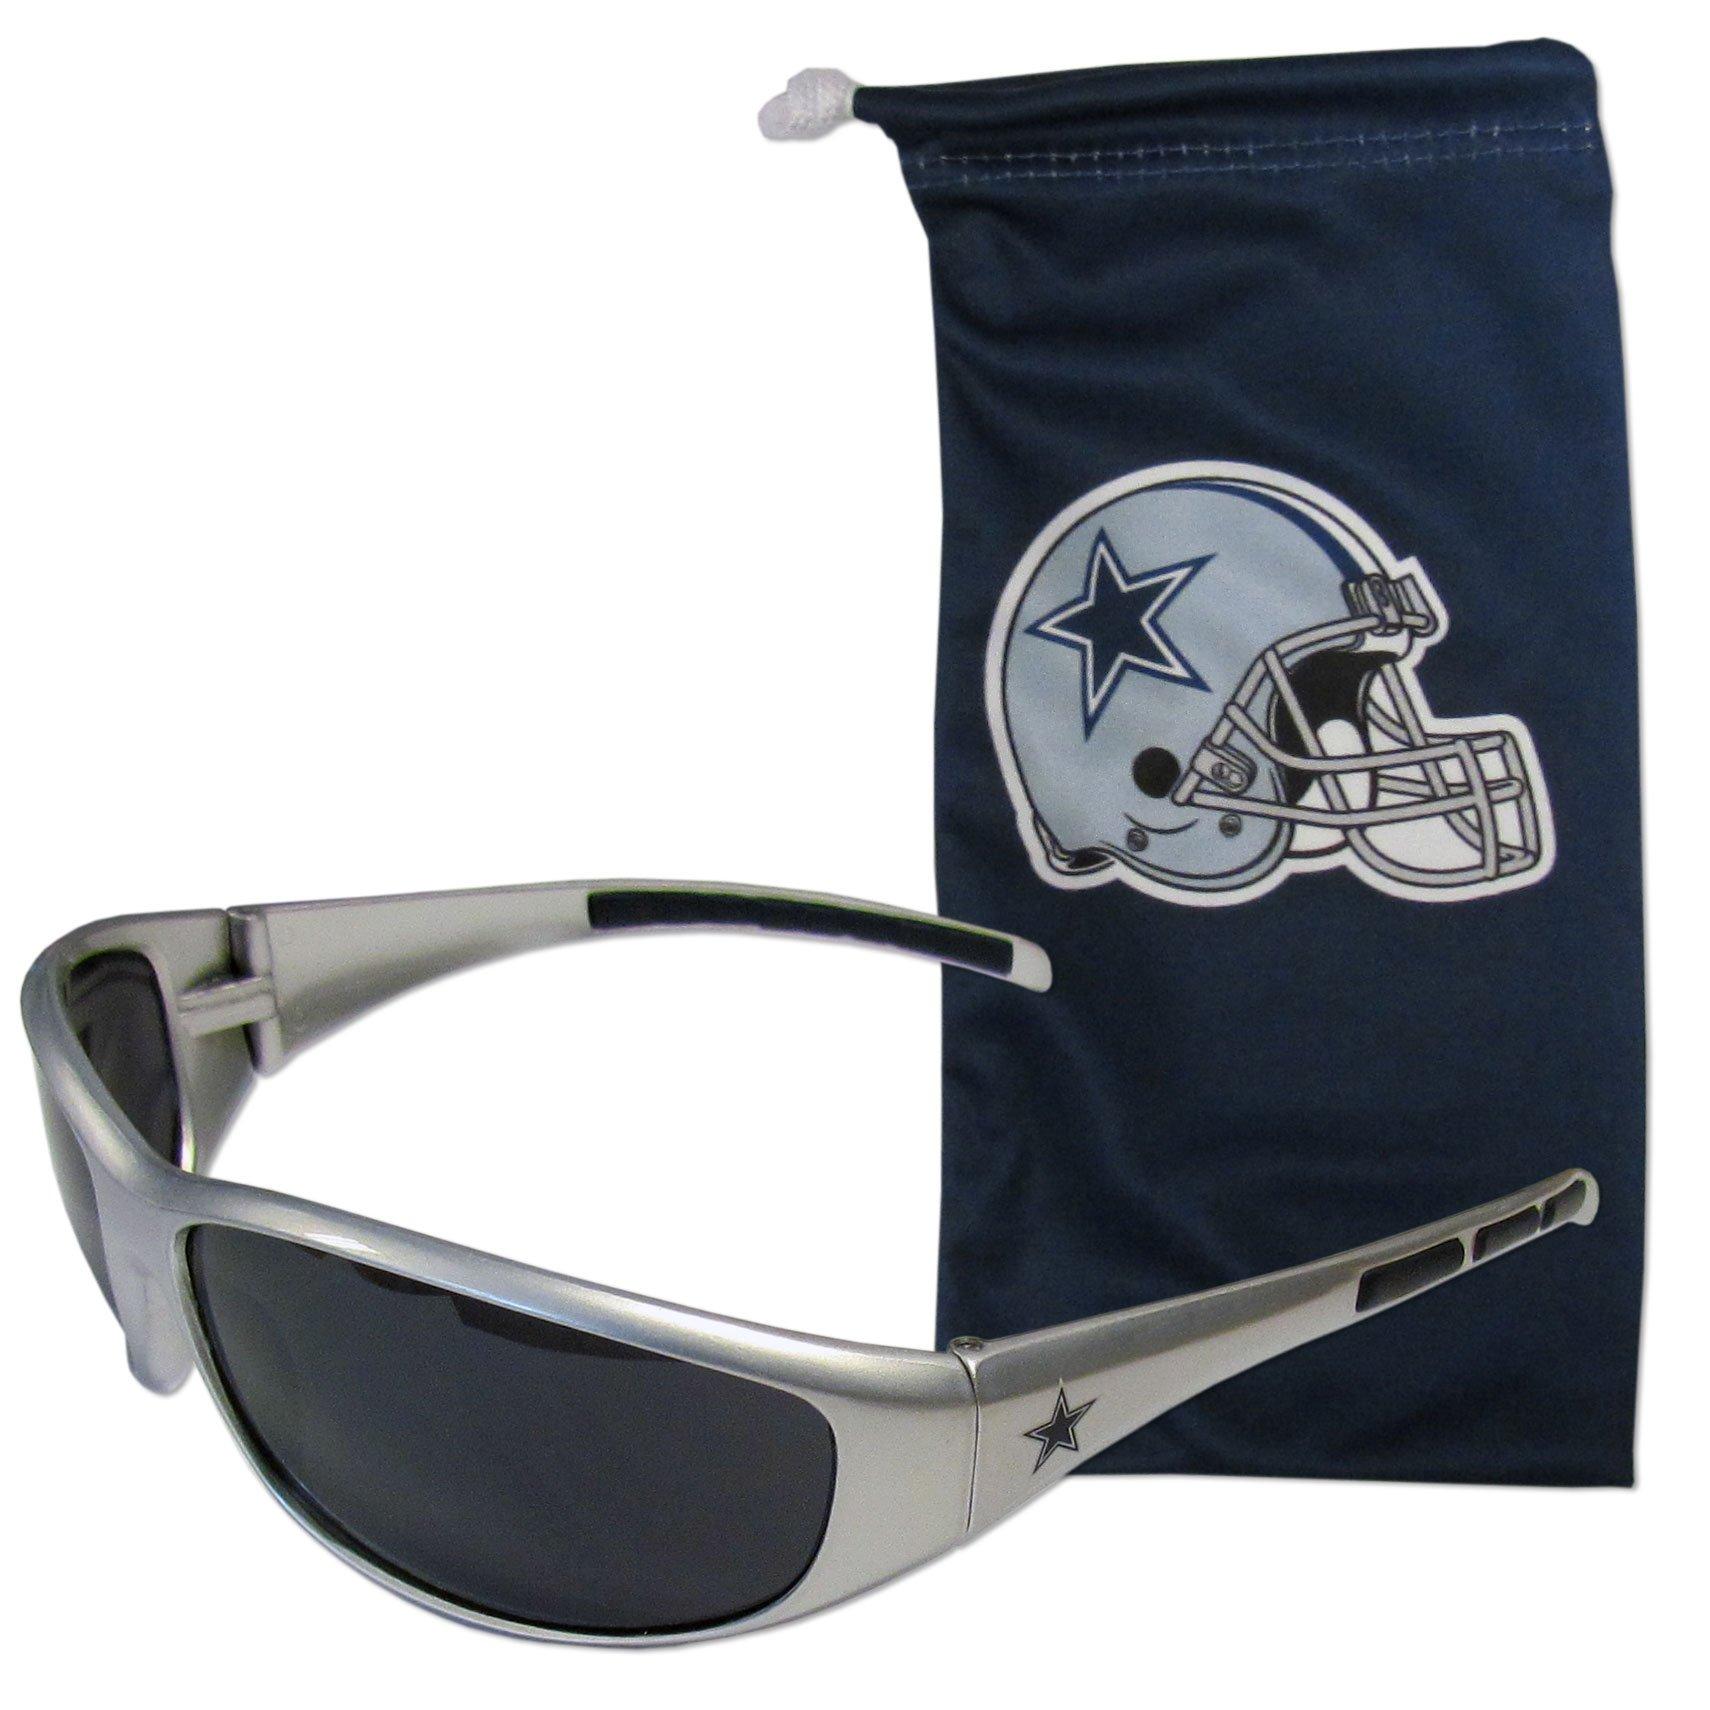 NFL Dallas Cowboys Adult Sunglass and Bag Set, Blue